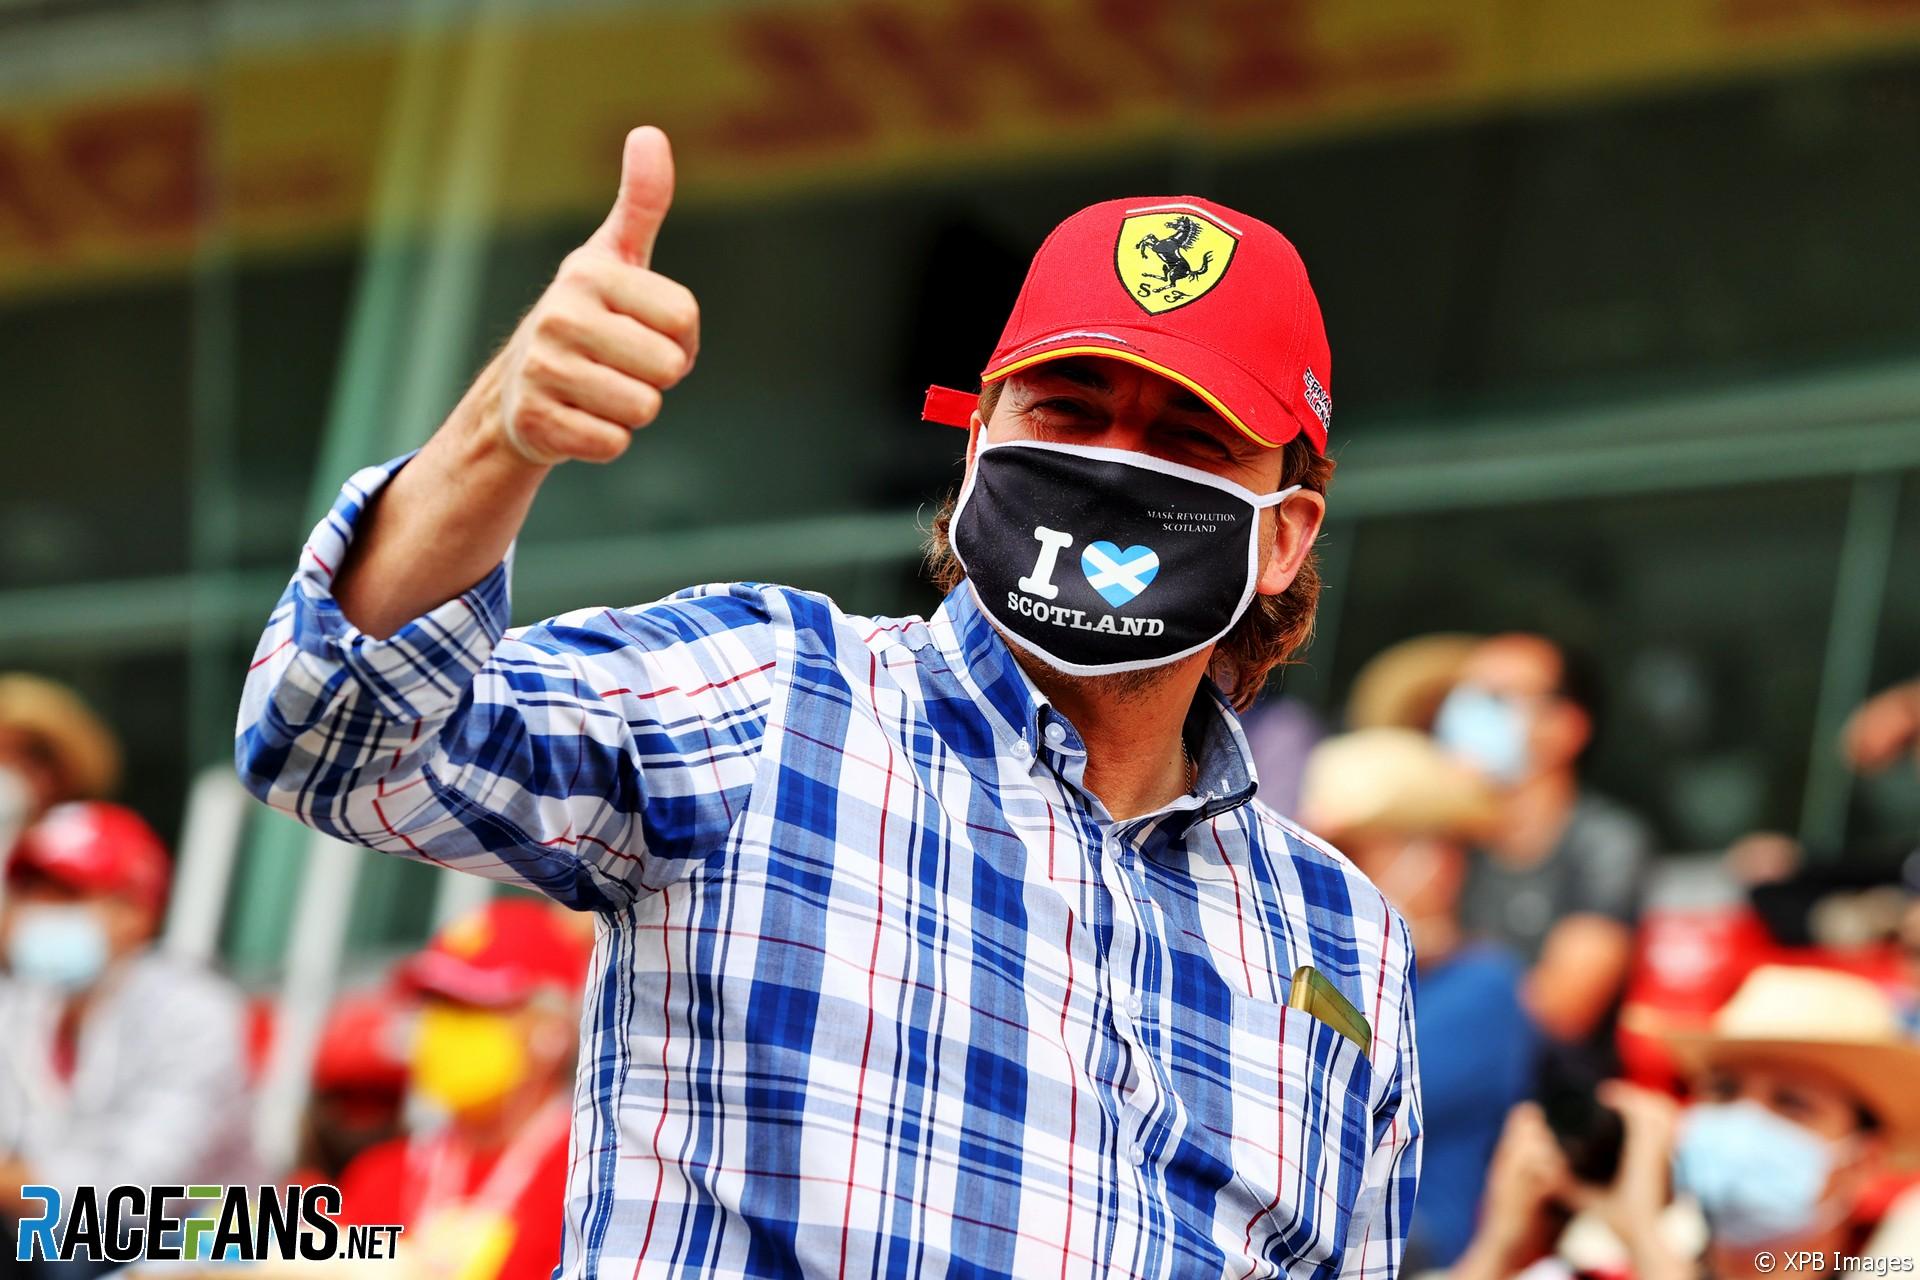 Fan, Circuit de Catalunya, 2021